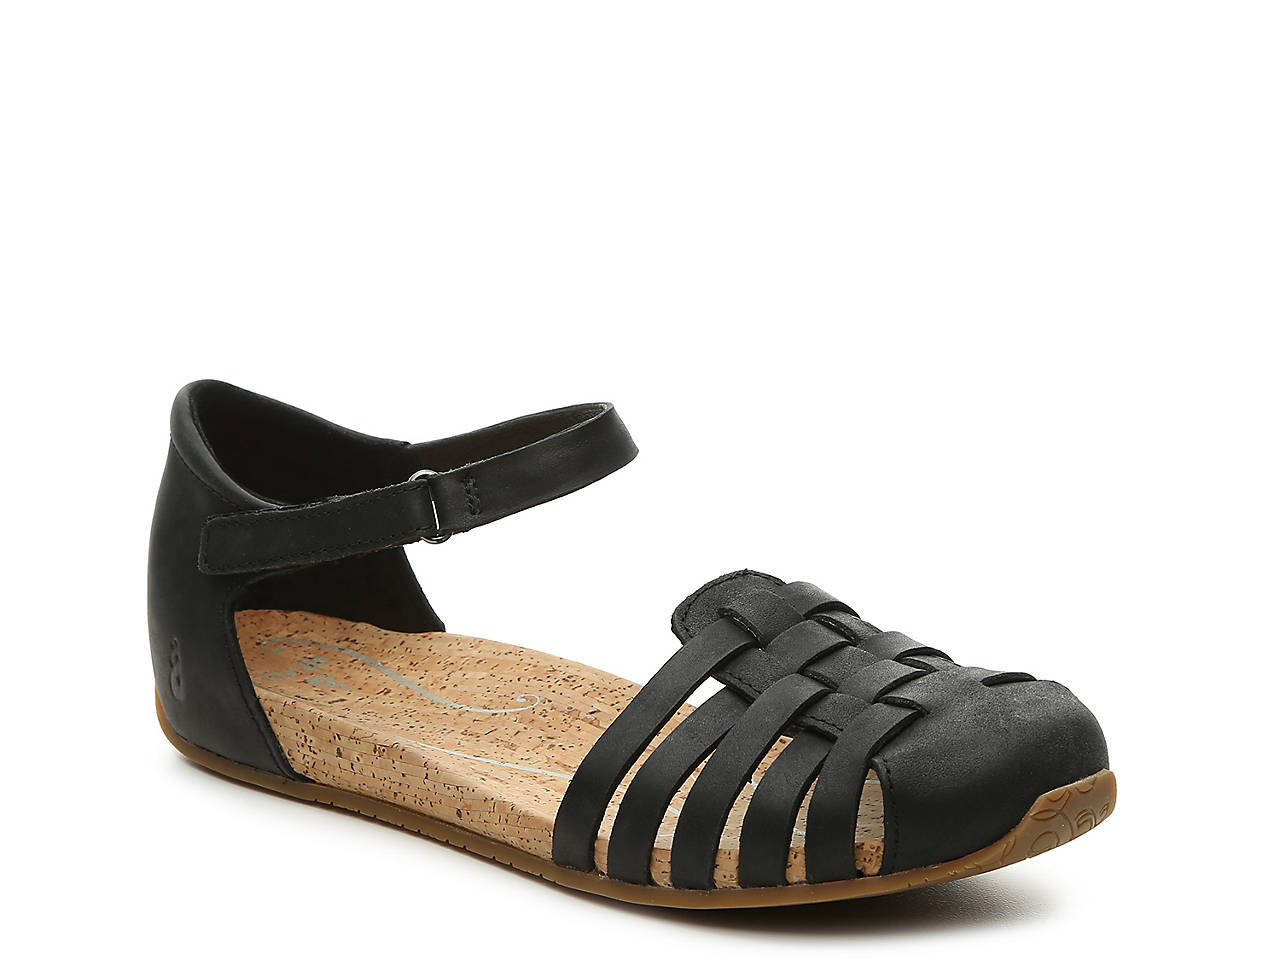 0e93c7a5803f Ahnu Malini Flat Women s Shoes